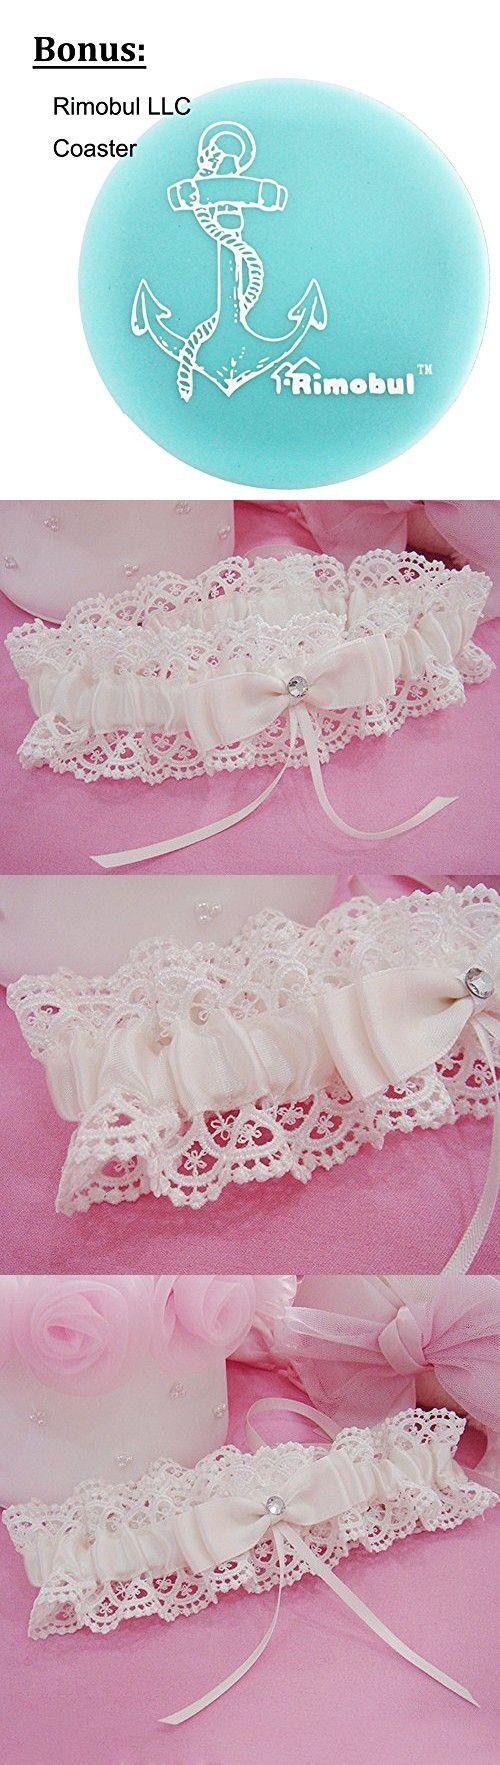 Kandi burruss wedding dress   best Wedding Garters images on Pinterest  Wedding stuff Bridal